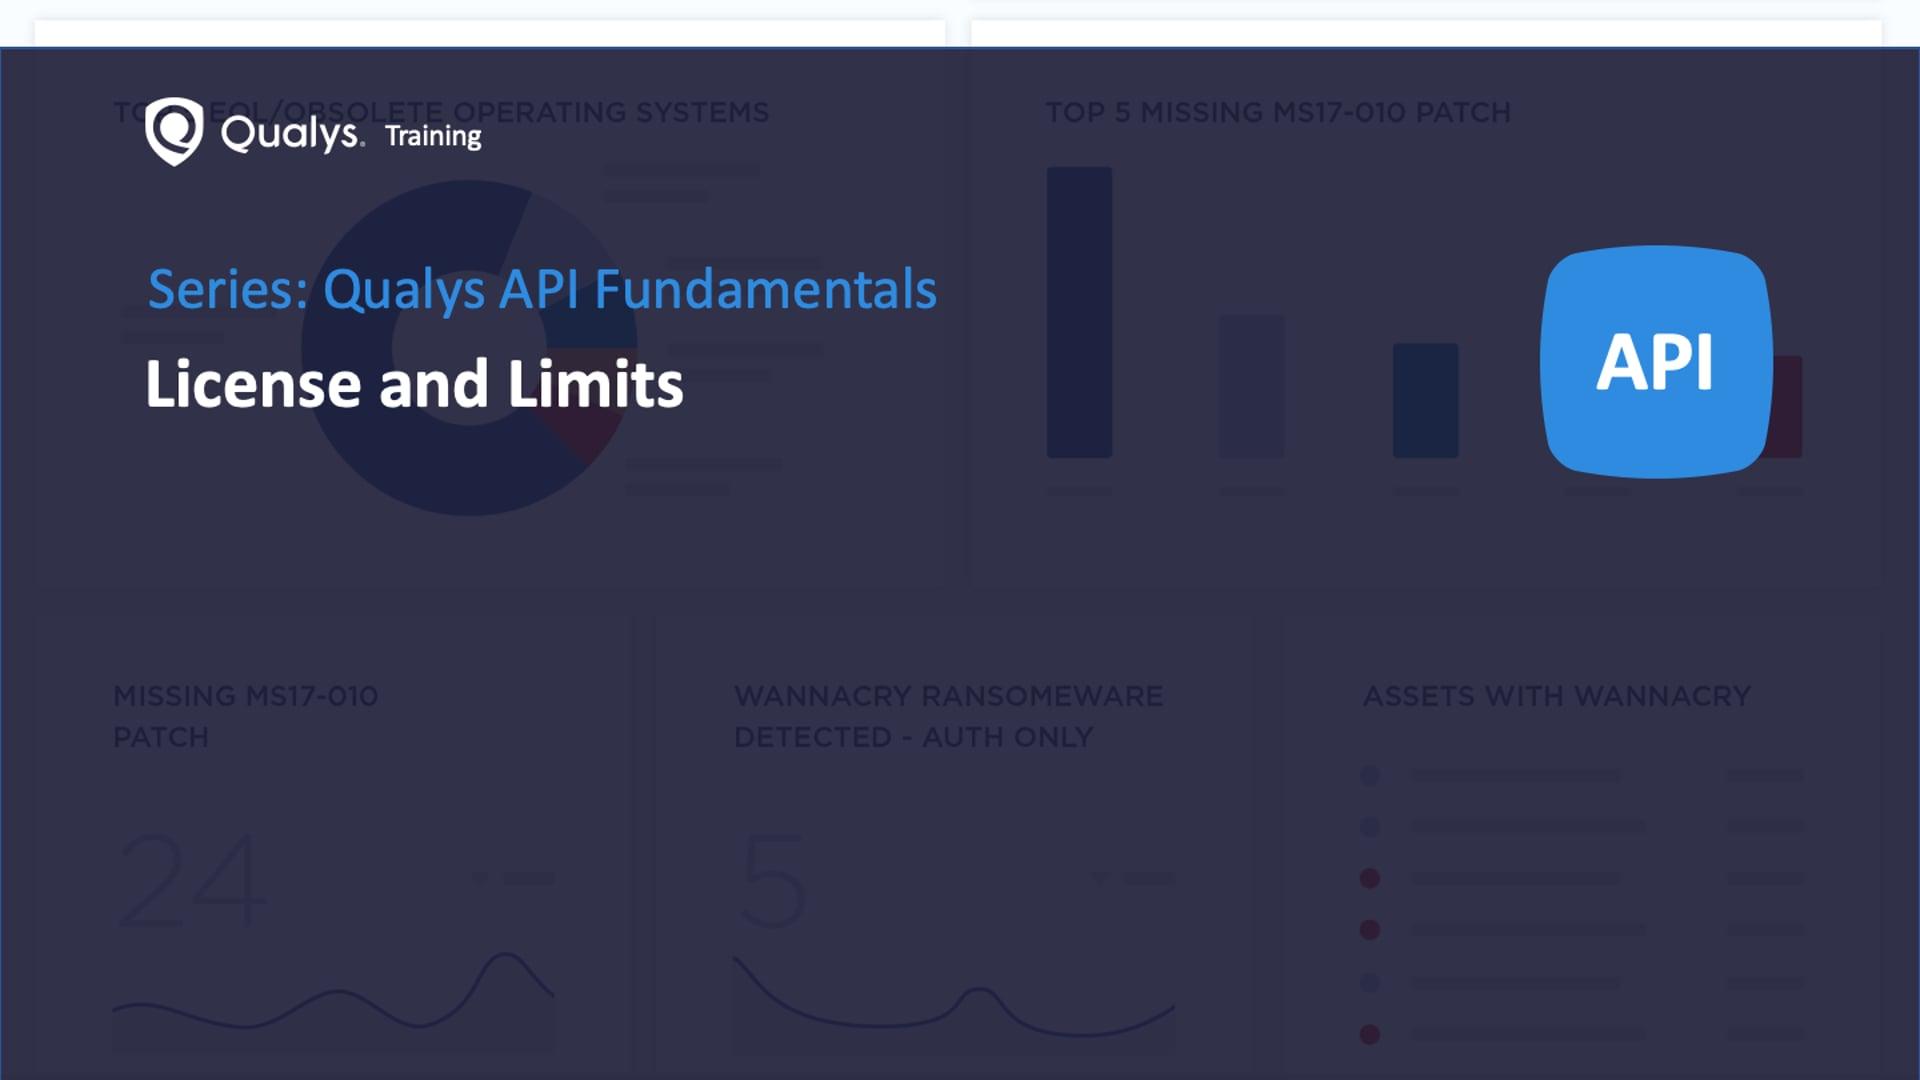 Qualys API - License and Limits